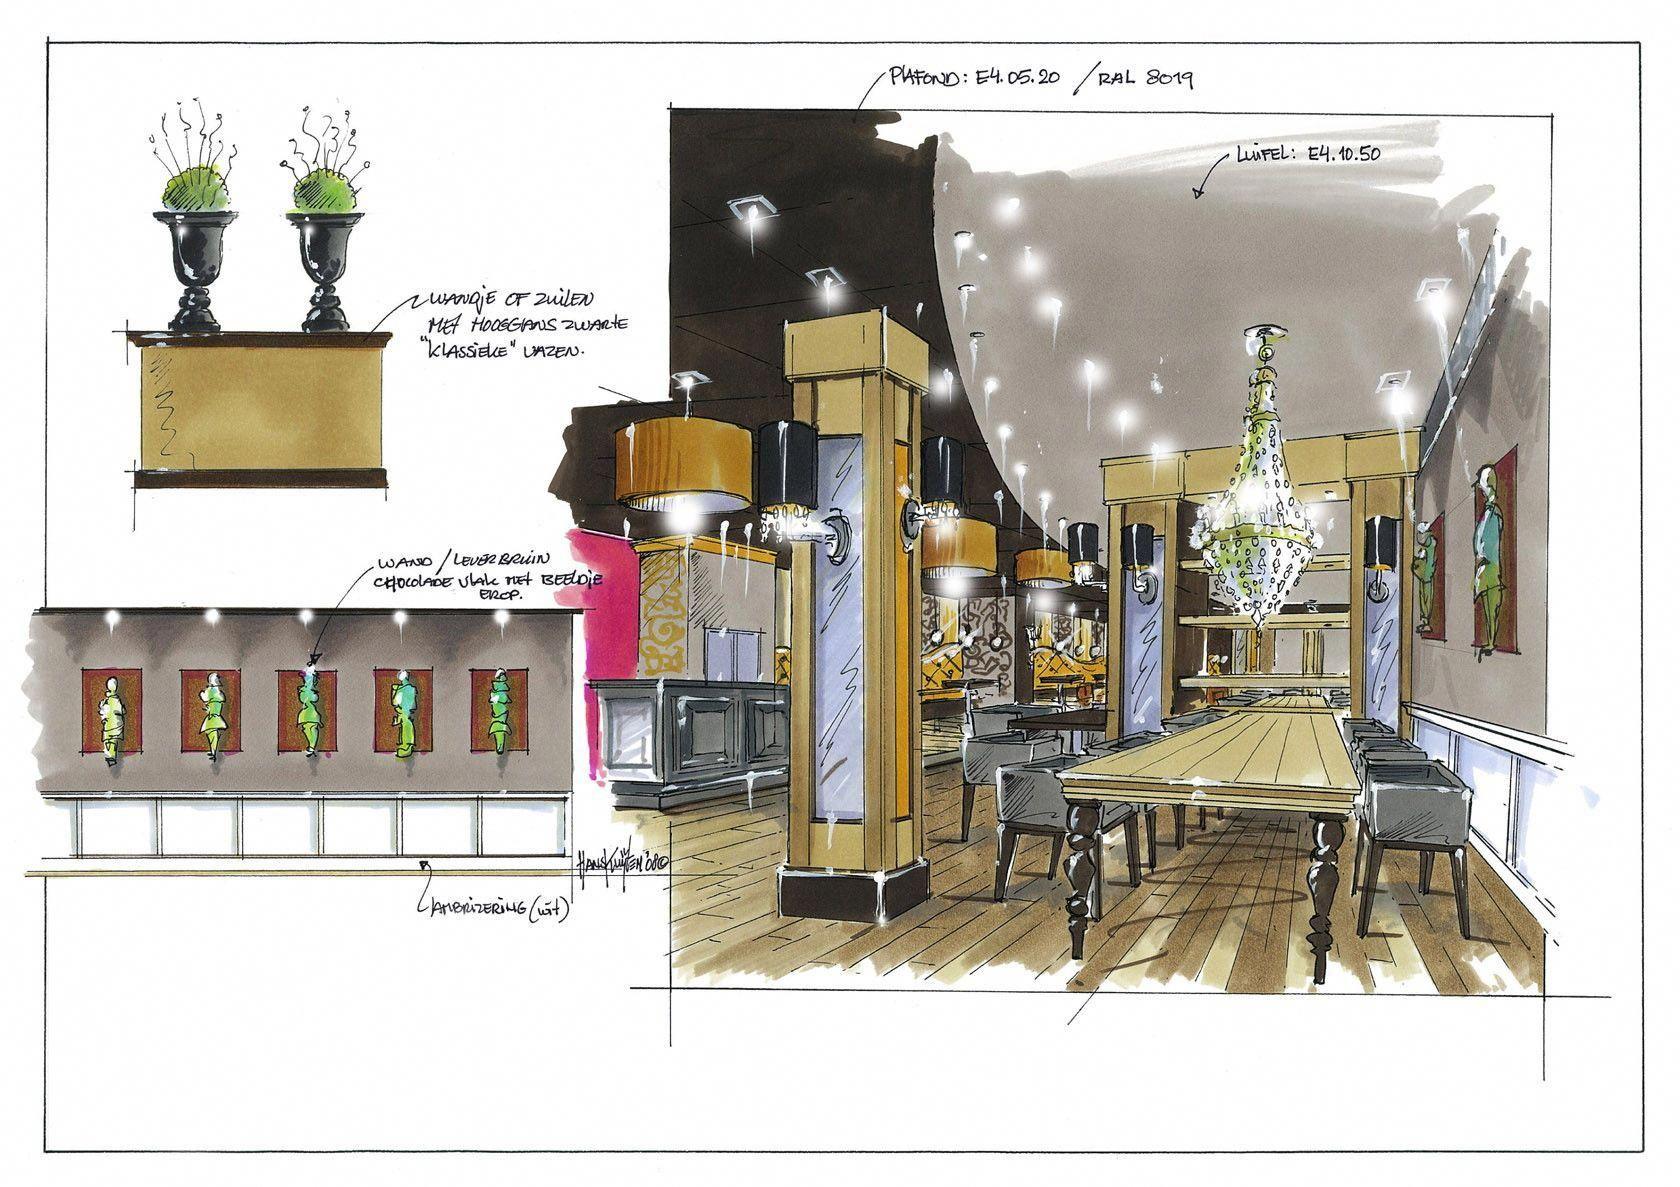 Pin By Mahasatwa On Interior Design Portfolios Interior Design Presentation Interior Design Portfolios Architecture Portfolio